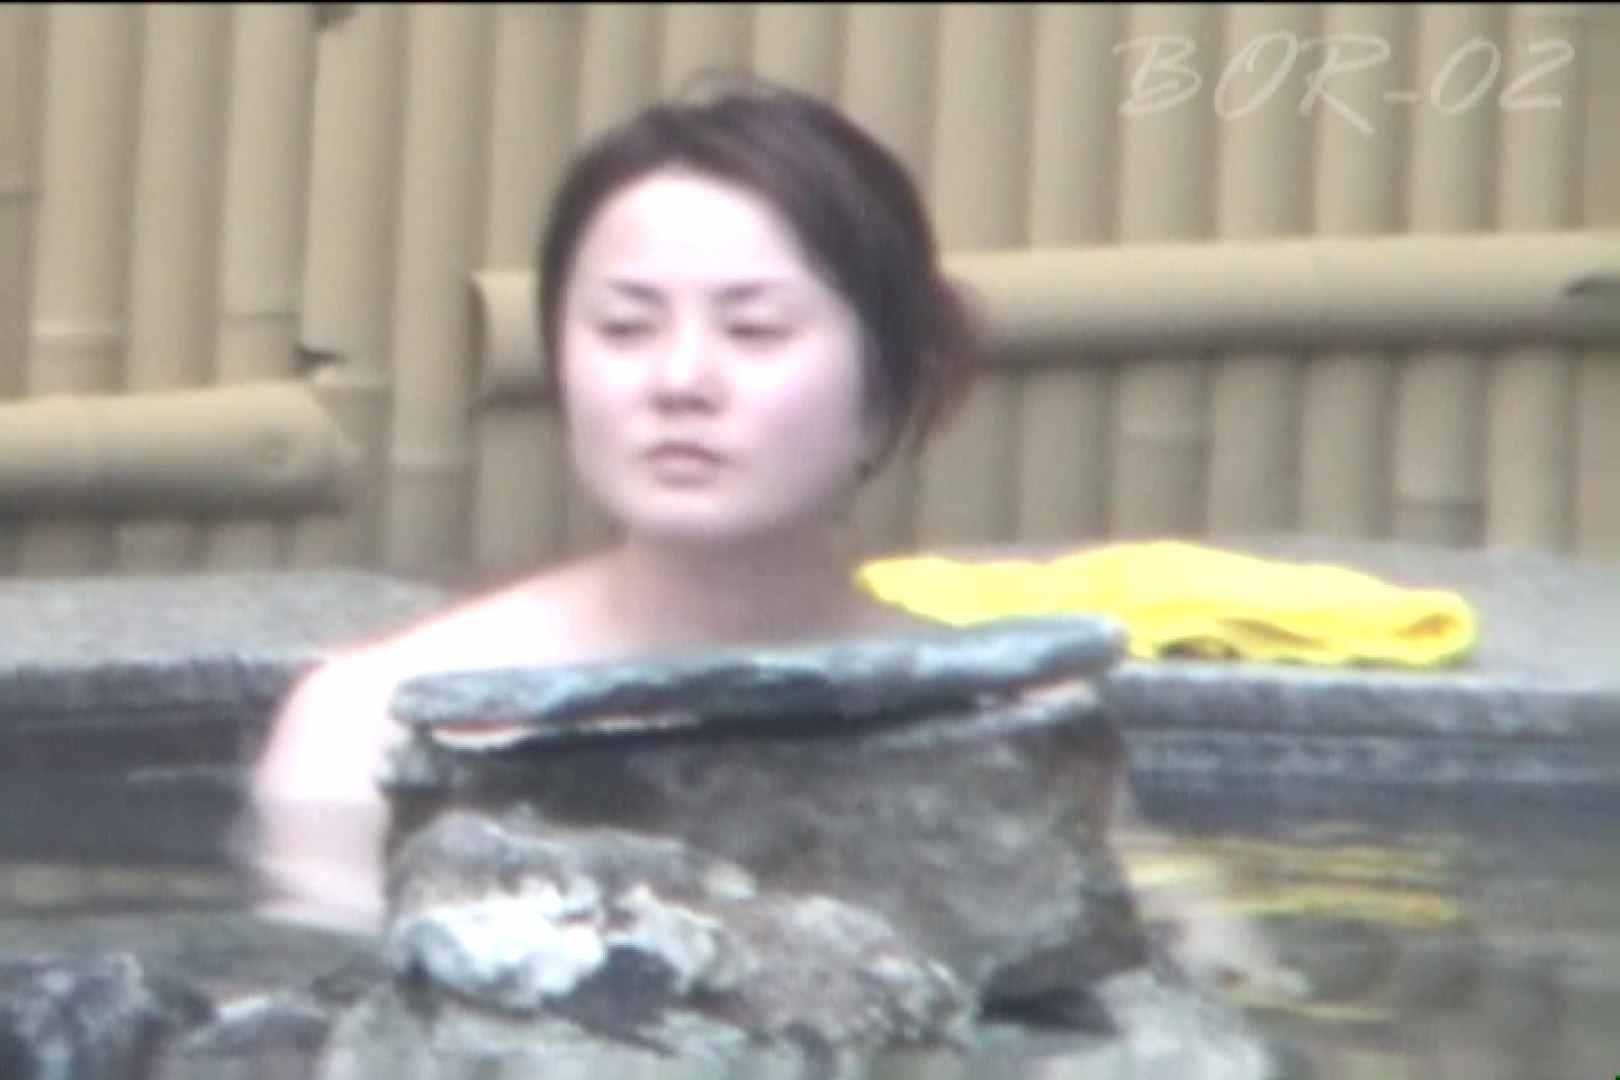 Aquaな露天風呂Vol.474 盗撮シリーズ | 露天風呂編  111PIX 1